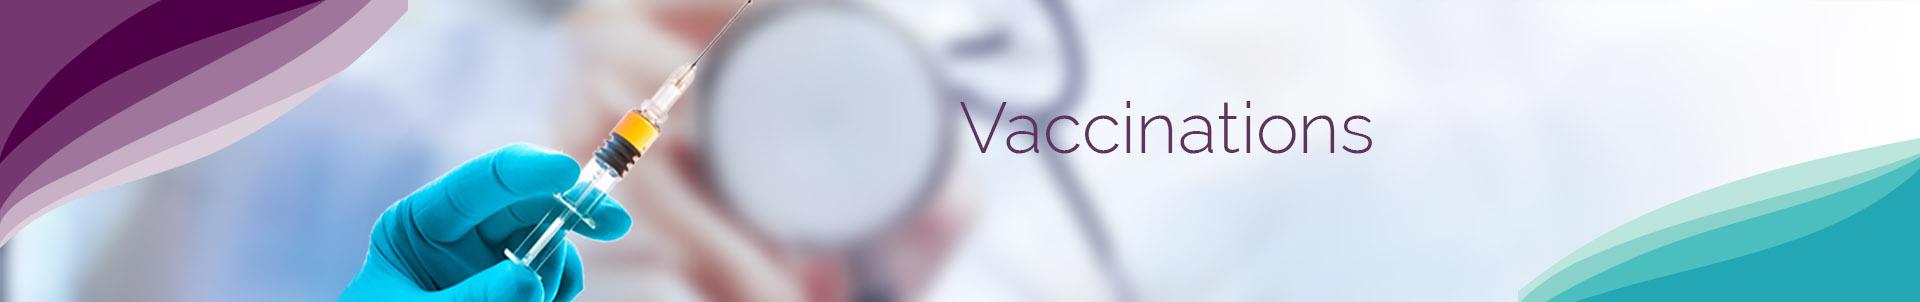 Vaccinations at Apollo Cradle